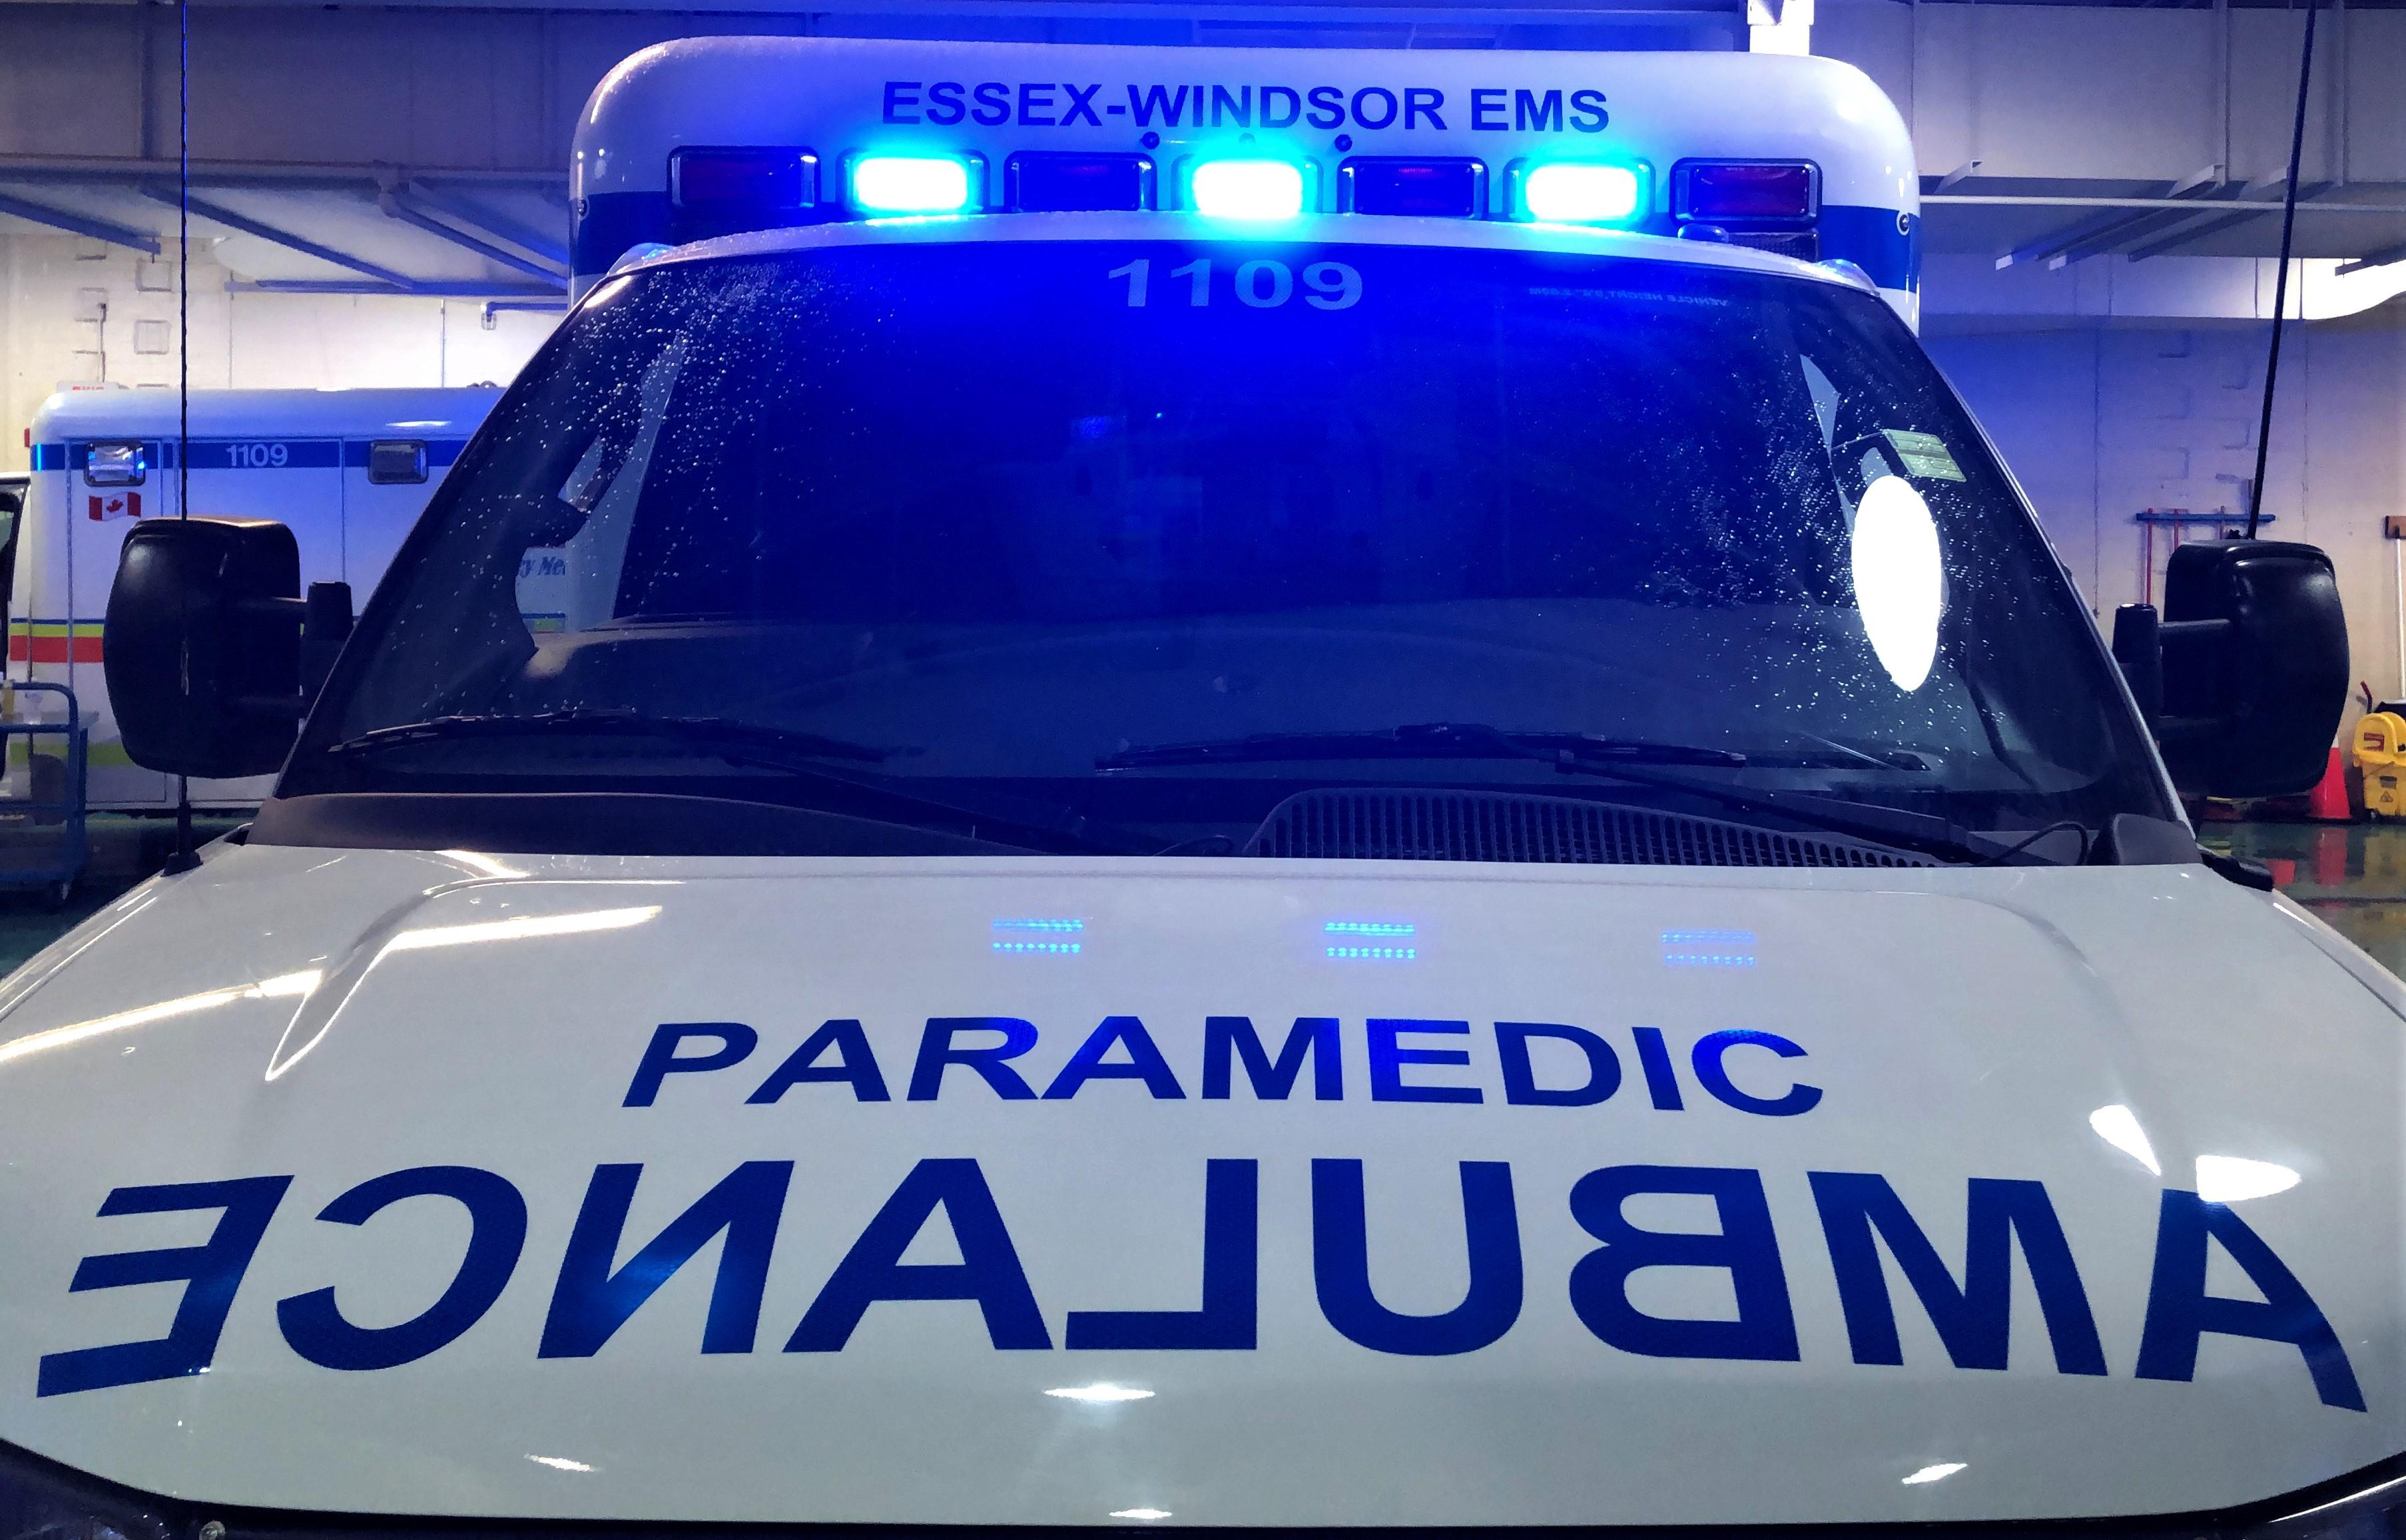 Blue lights flash on the front of an Essex-Windsor EMS ambulance.